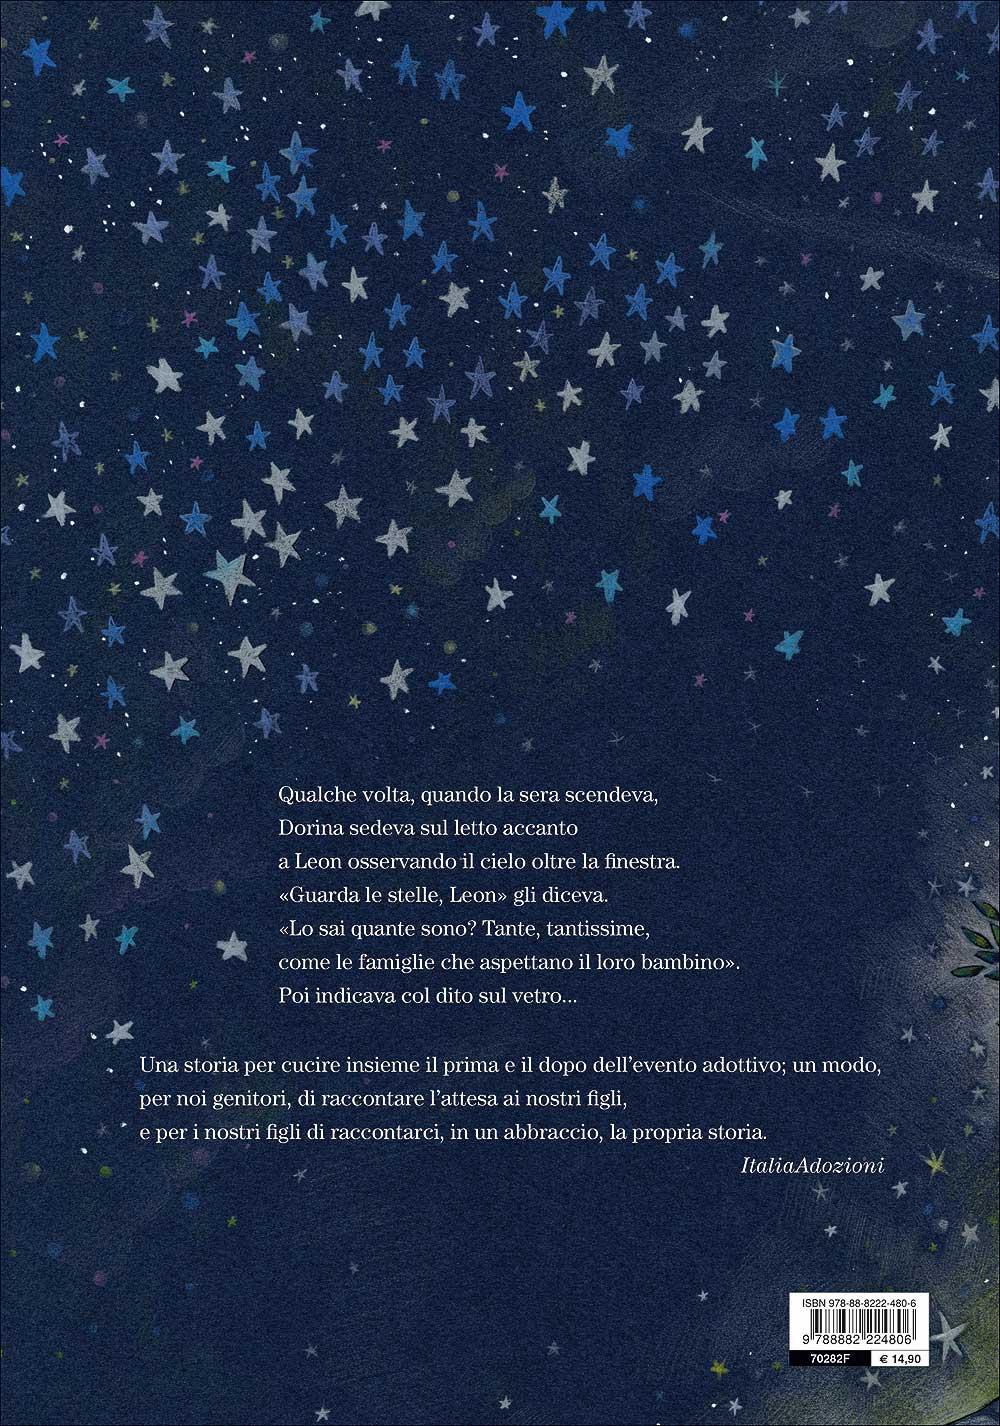 Guarda le stelle